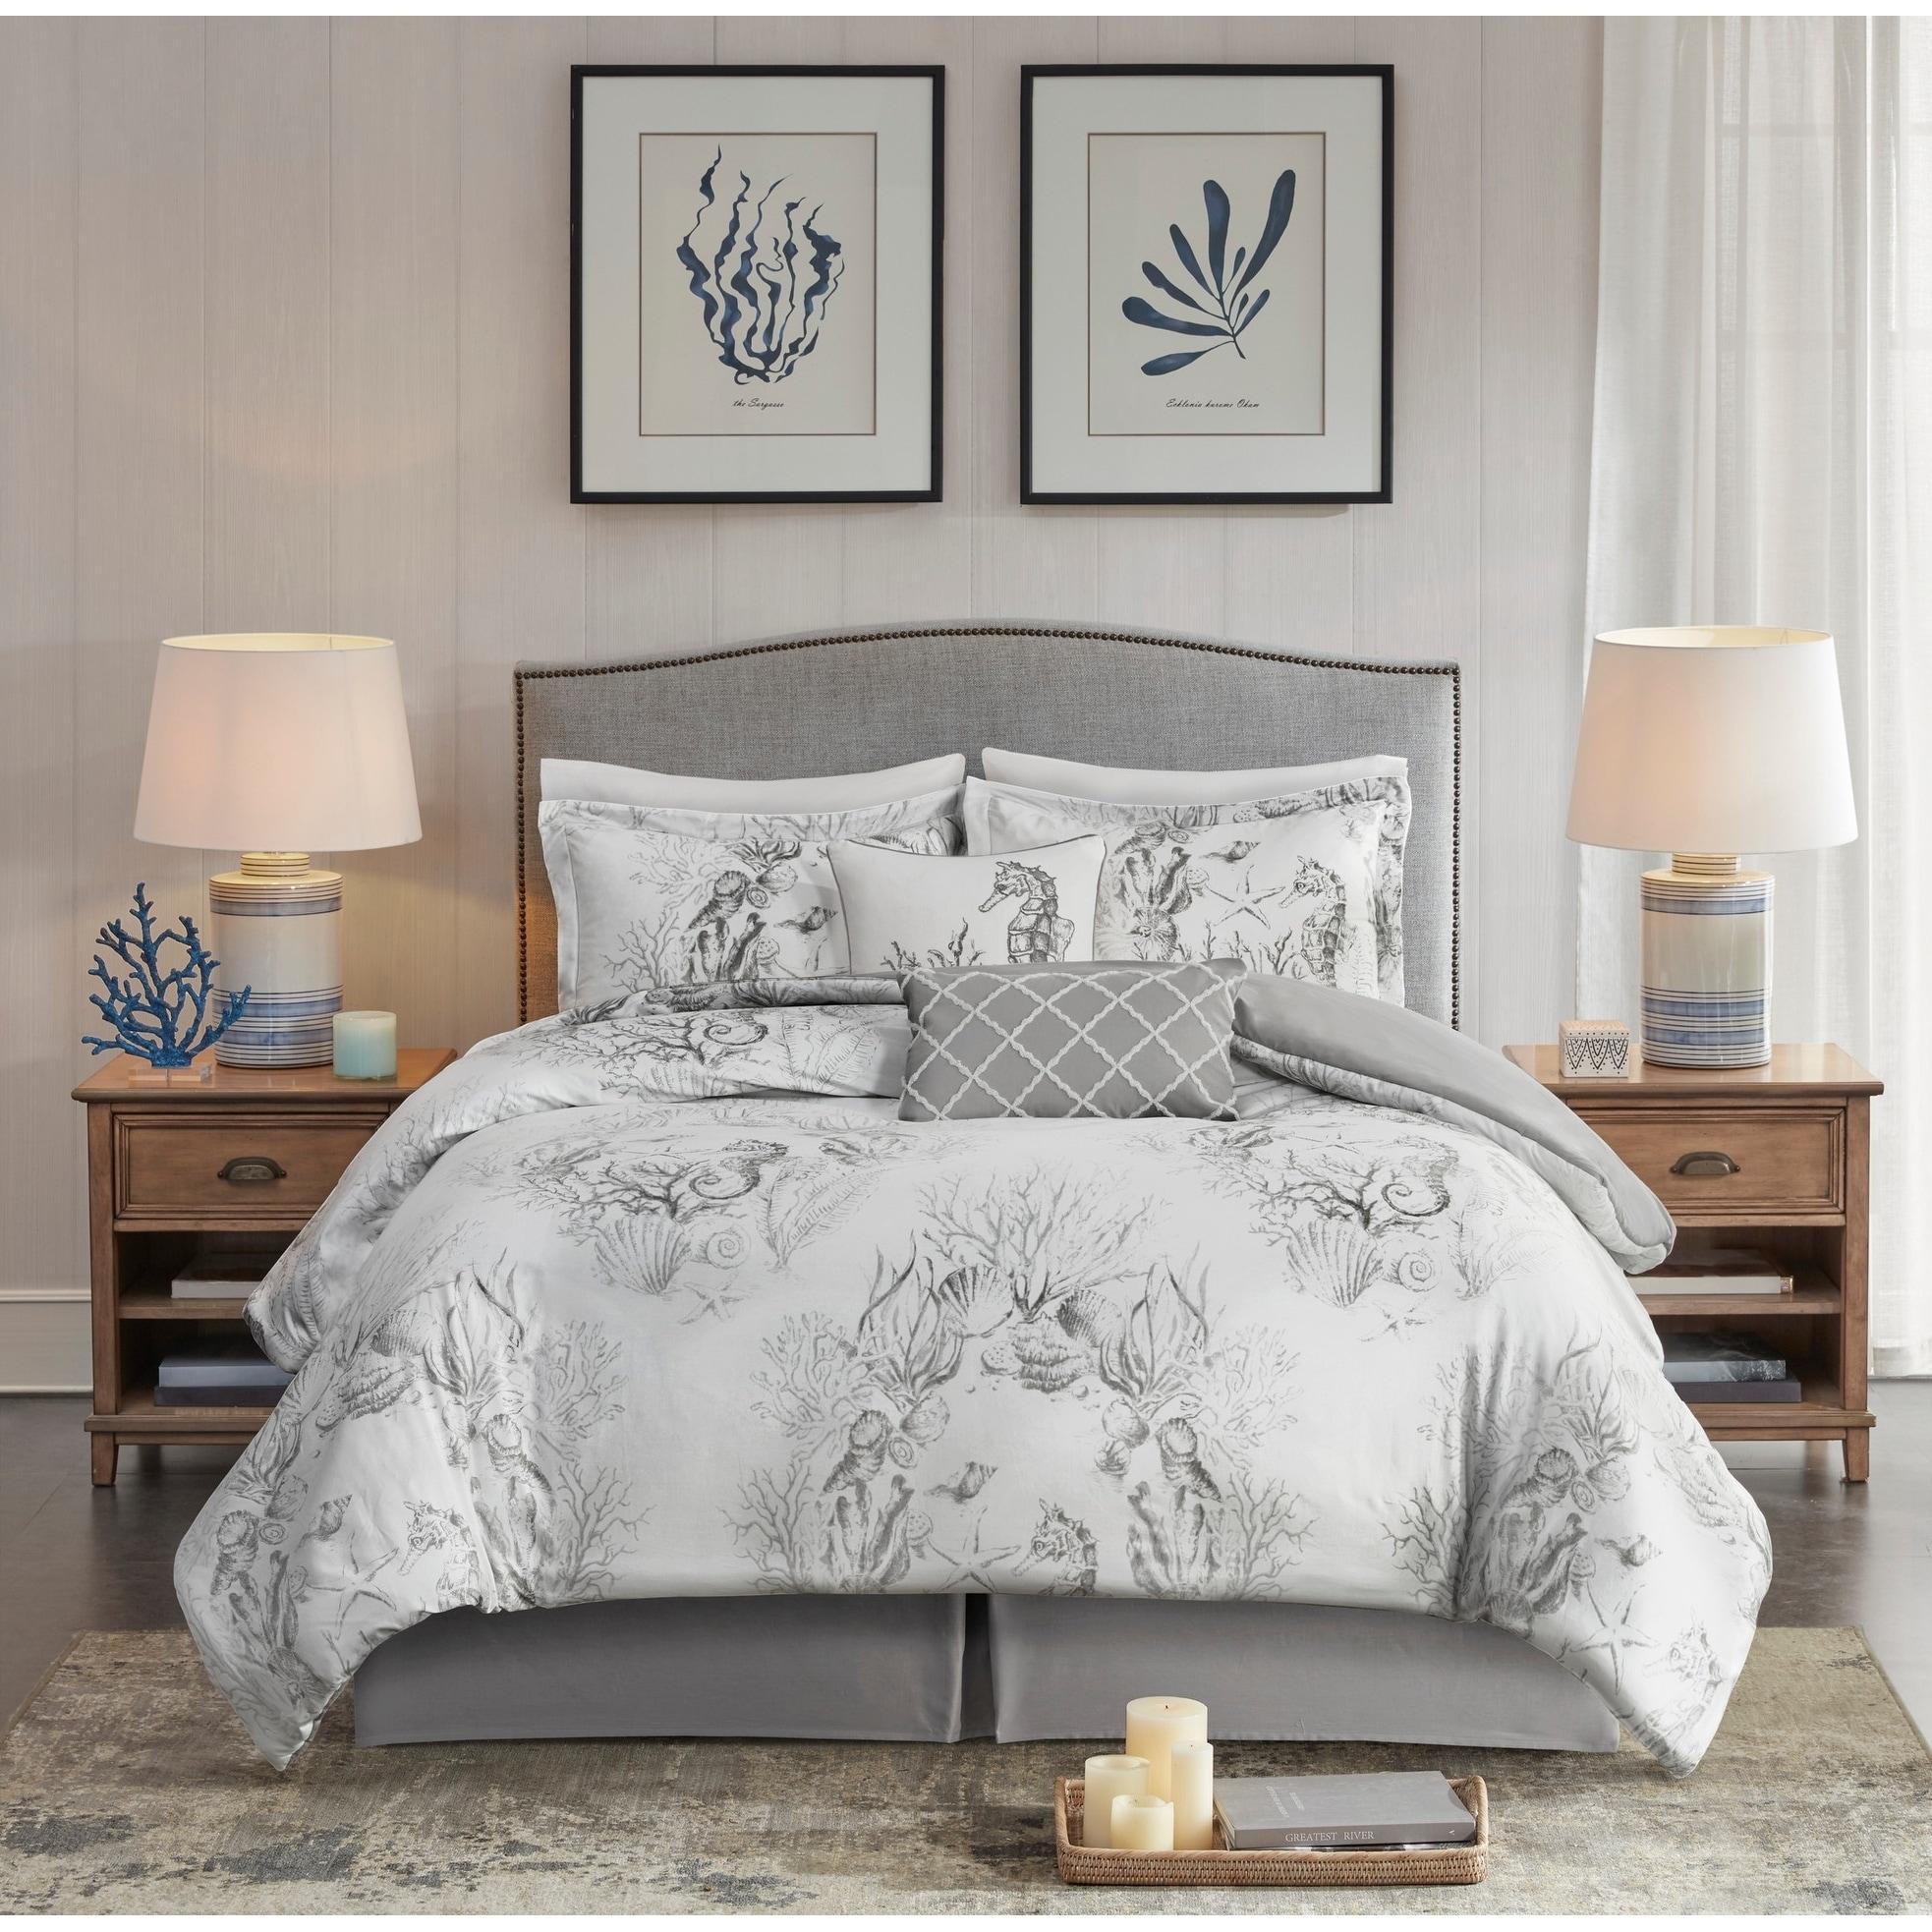 Harbor House Sea Breeze White Grey 6 Piece Cotton Sateen Comforter Set Overstock 29366333